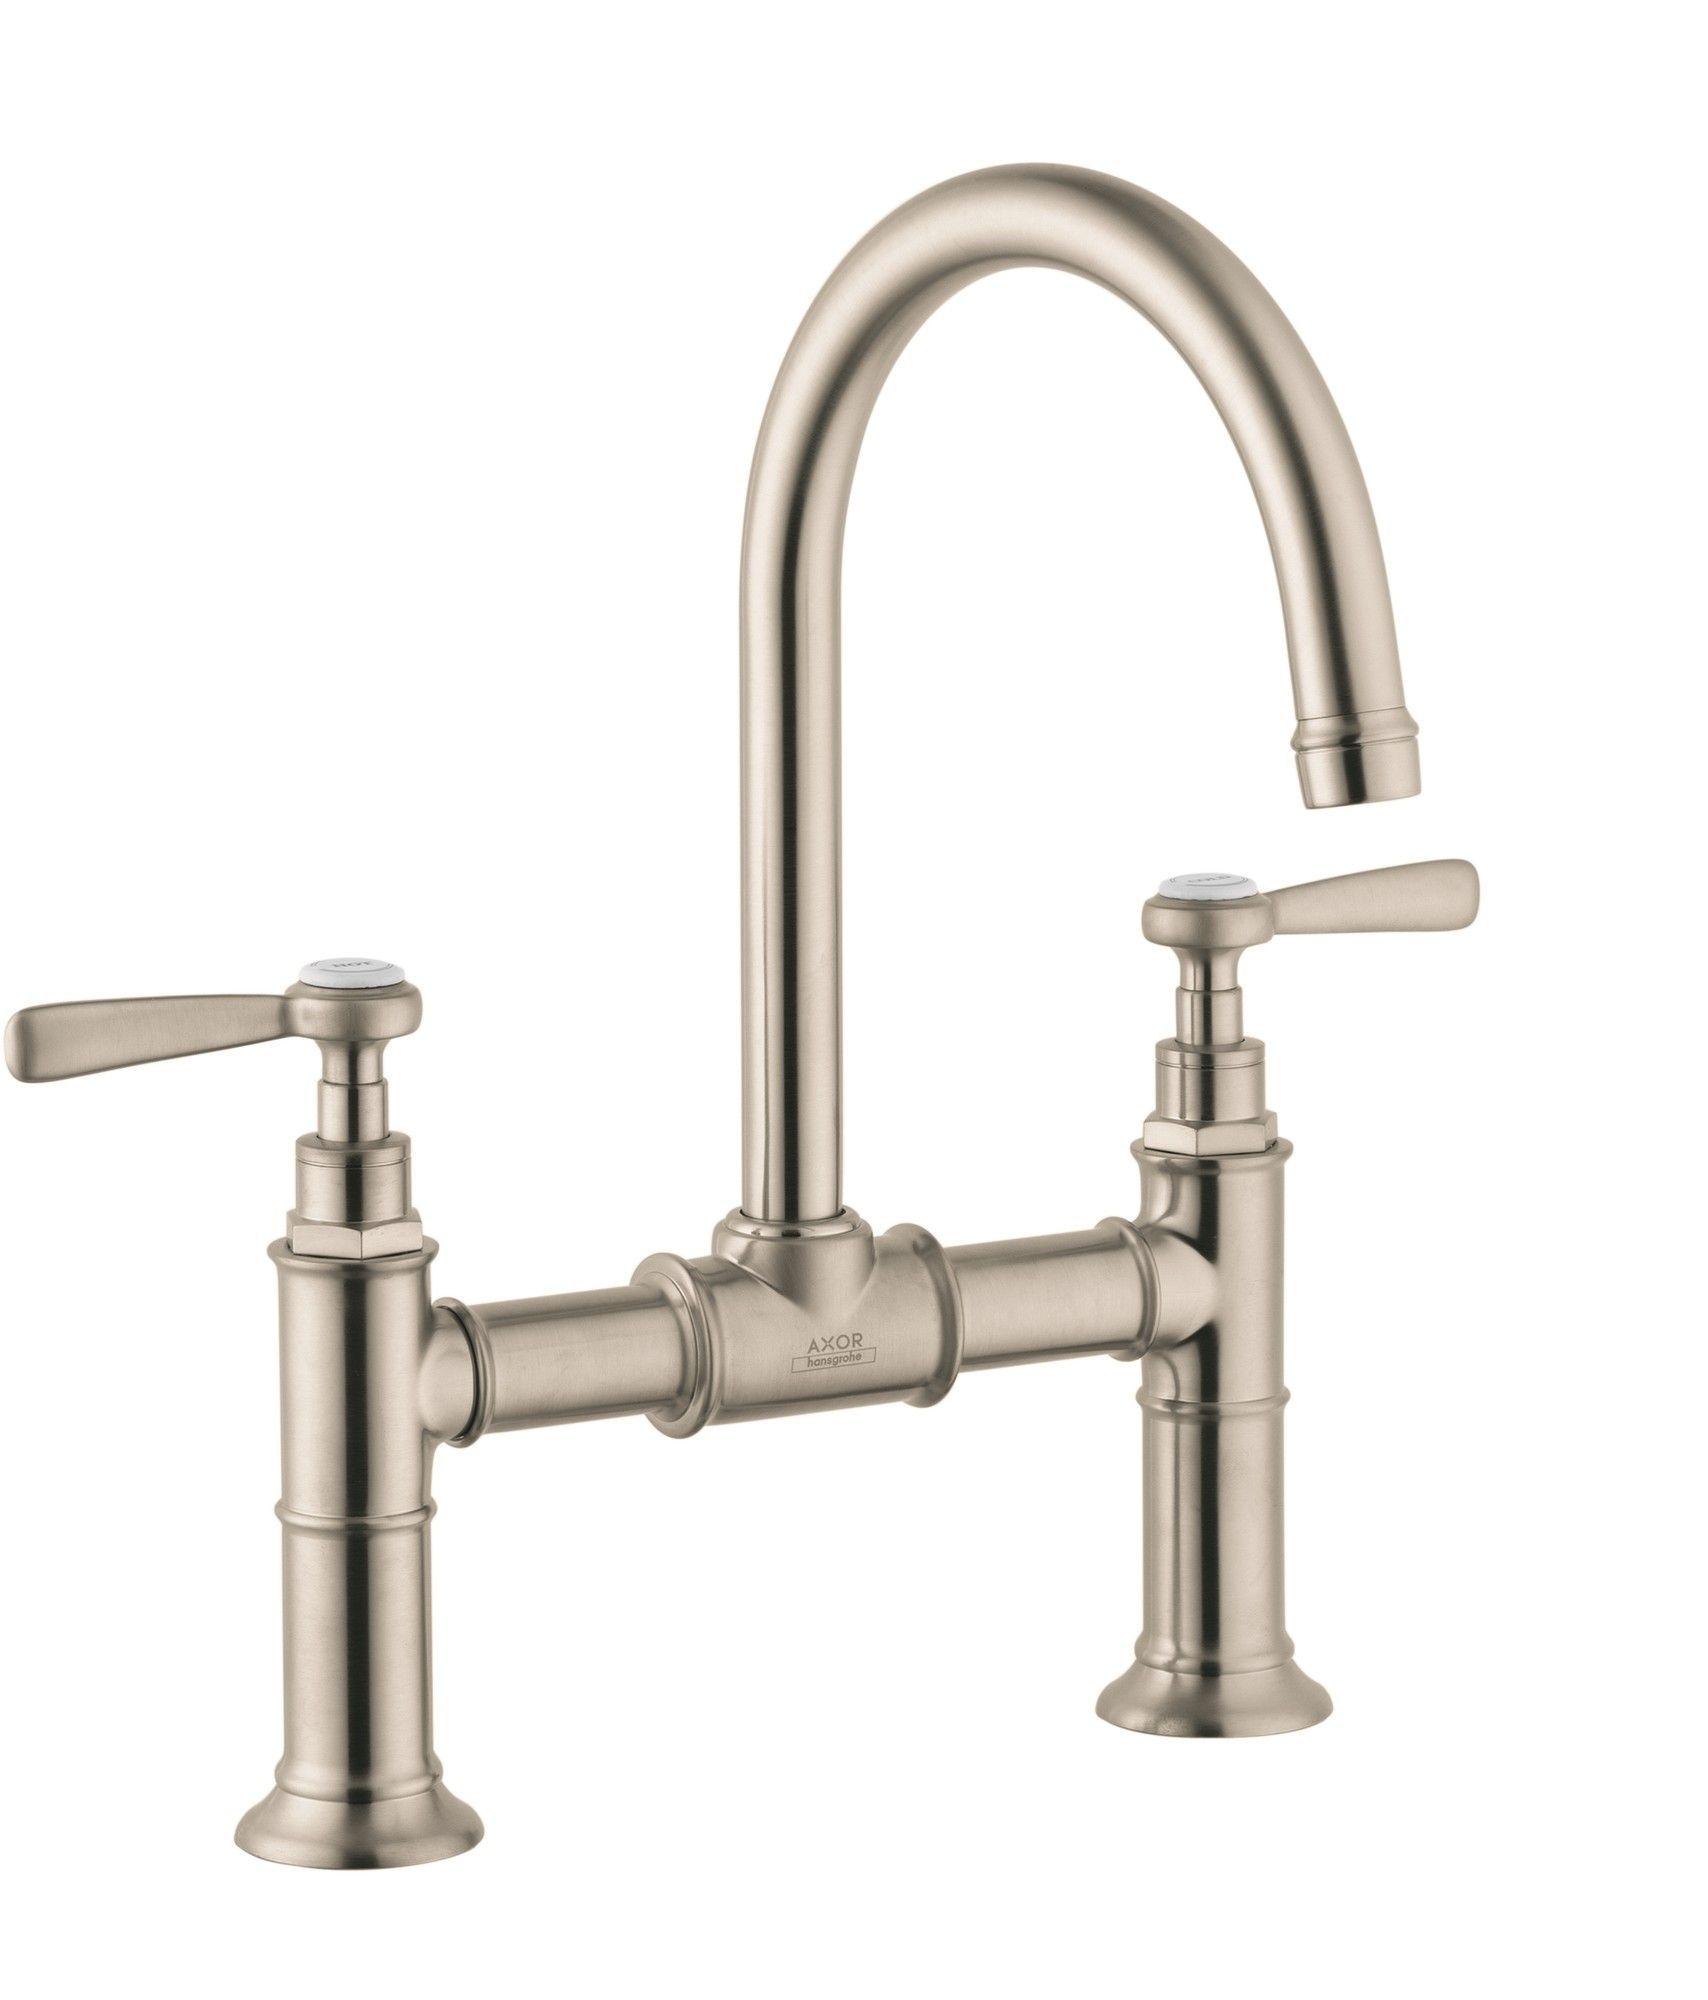 Axor montreux double handle widespread bathroom faucet bathroom